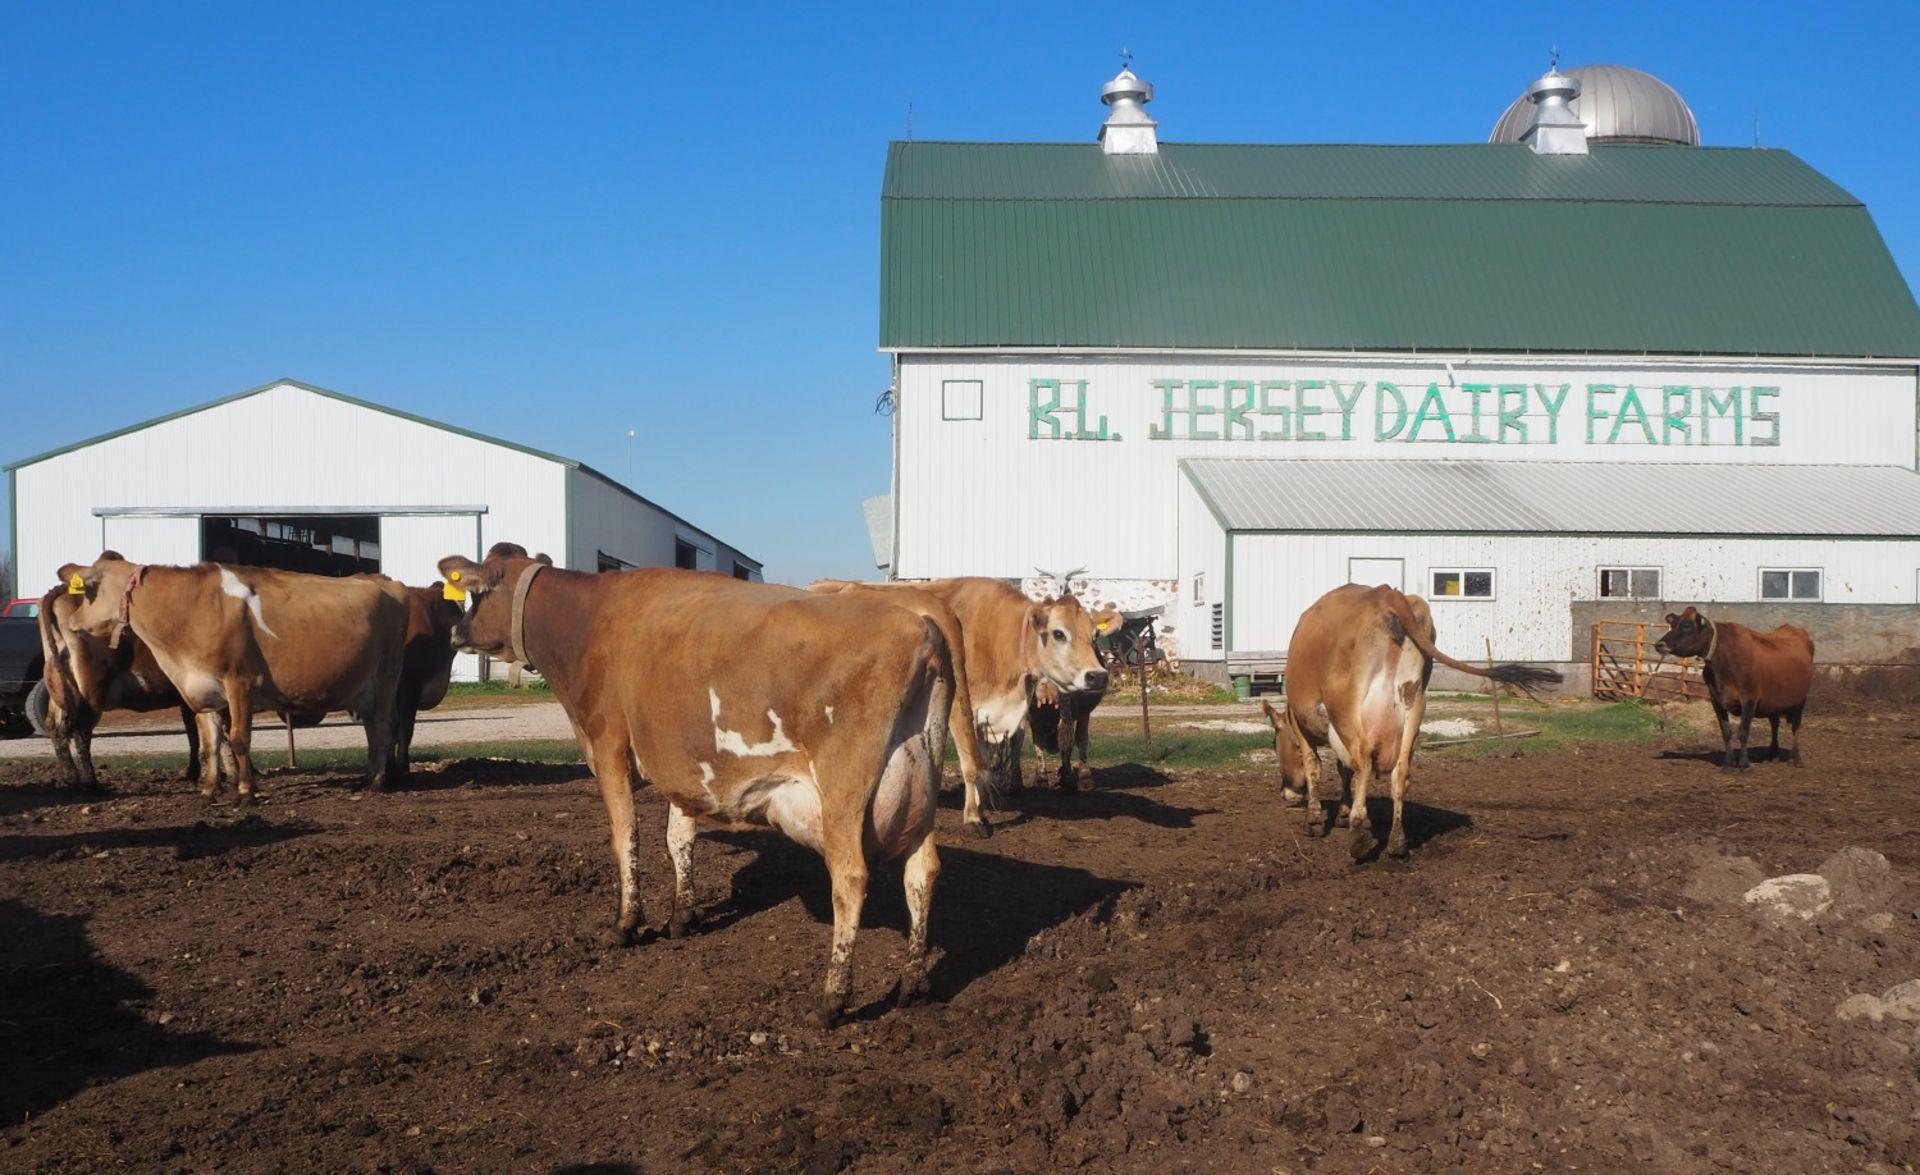 R.L Jersey Dairy Farms Retirement Auction, Thursday, April 8, 2021 10:00 a.m. Selling…complete - Image 2 of 3